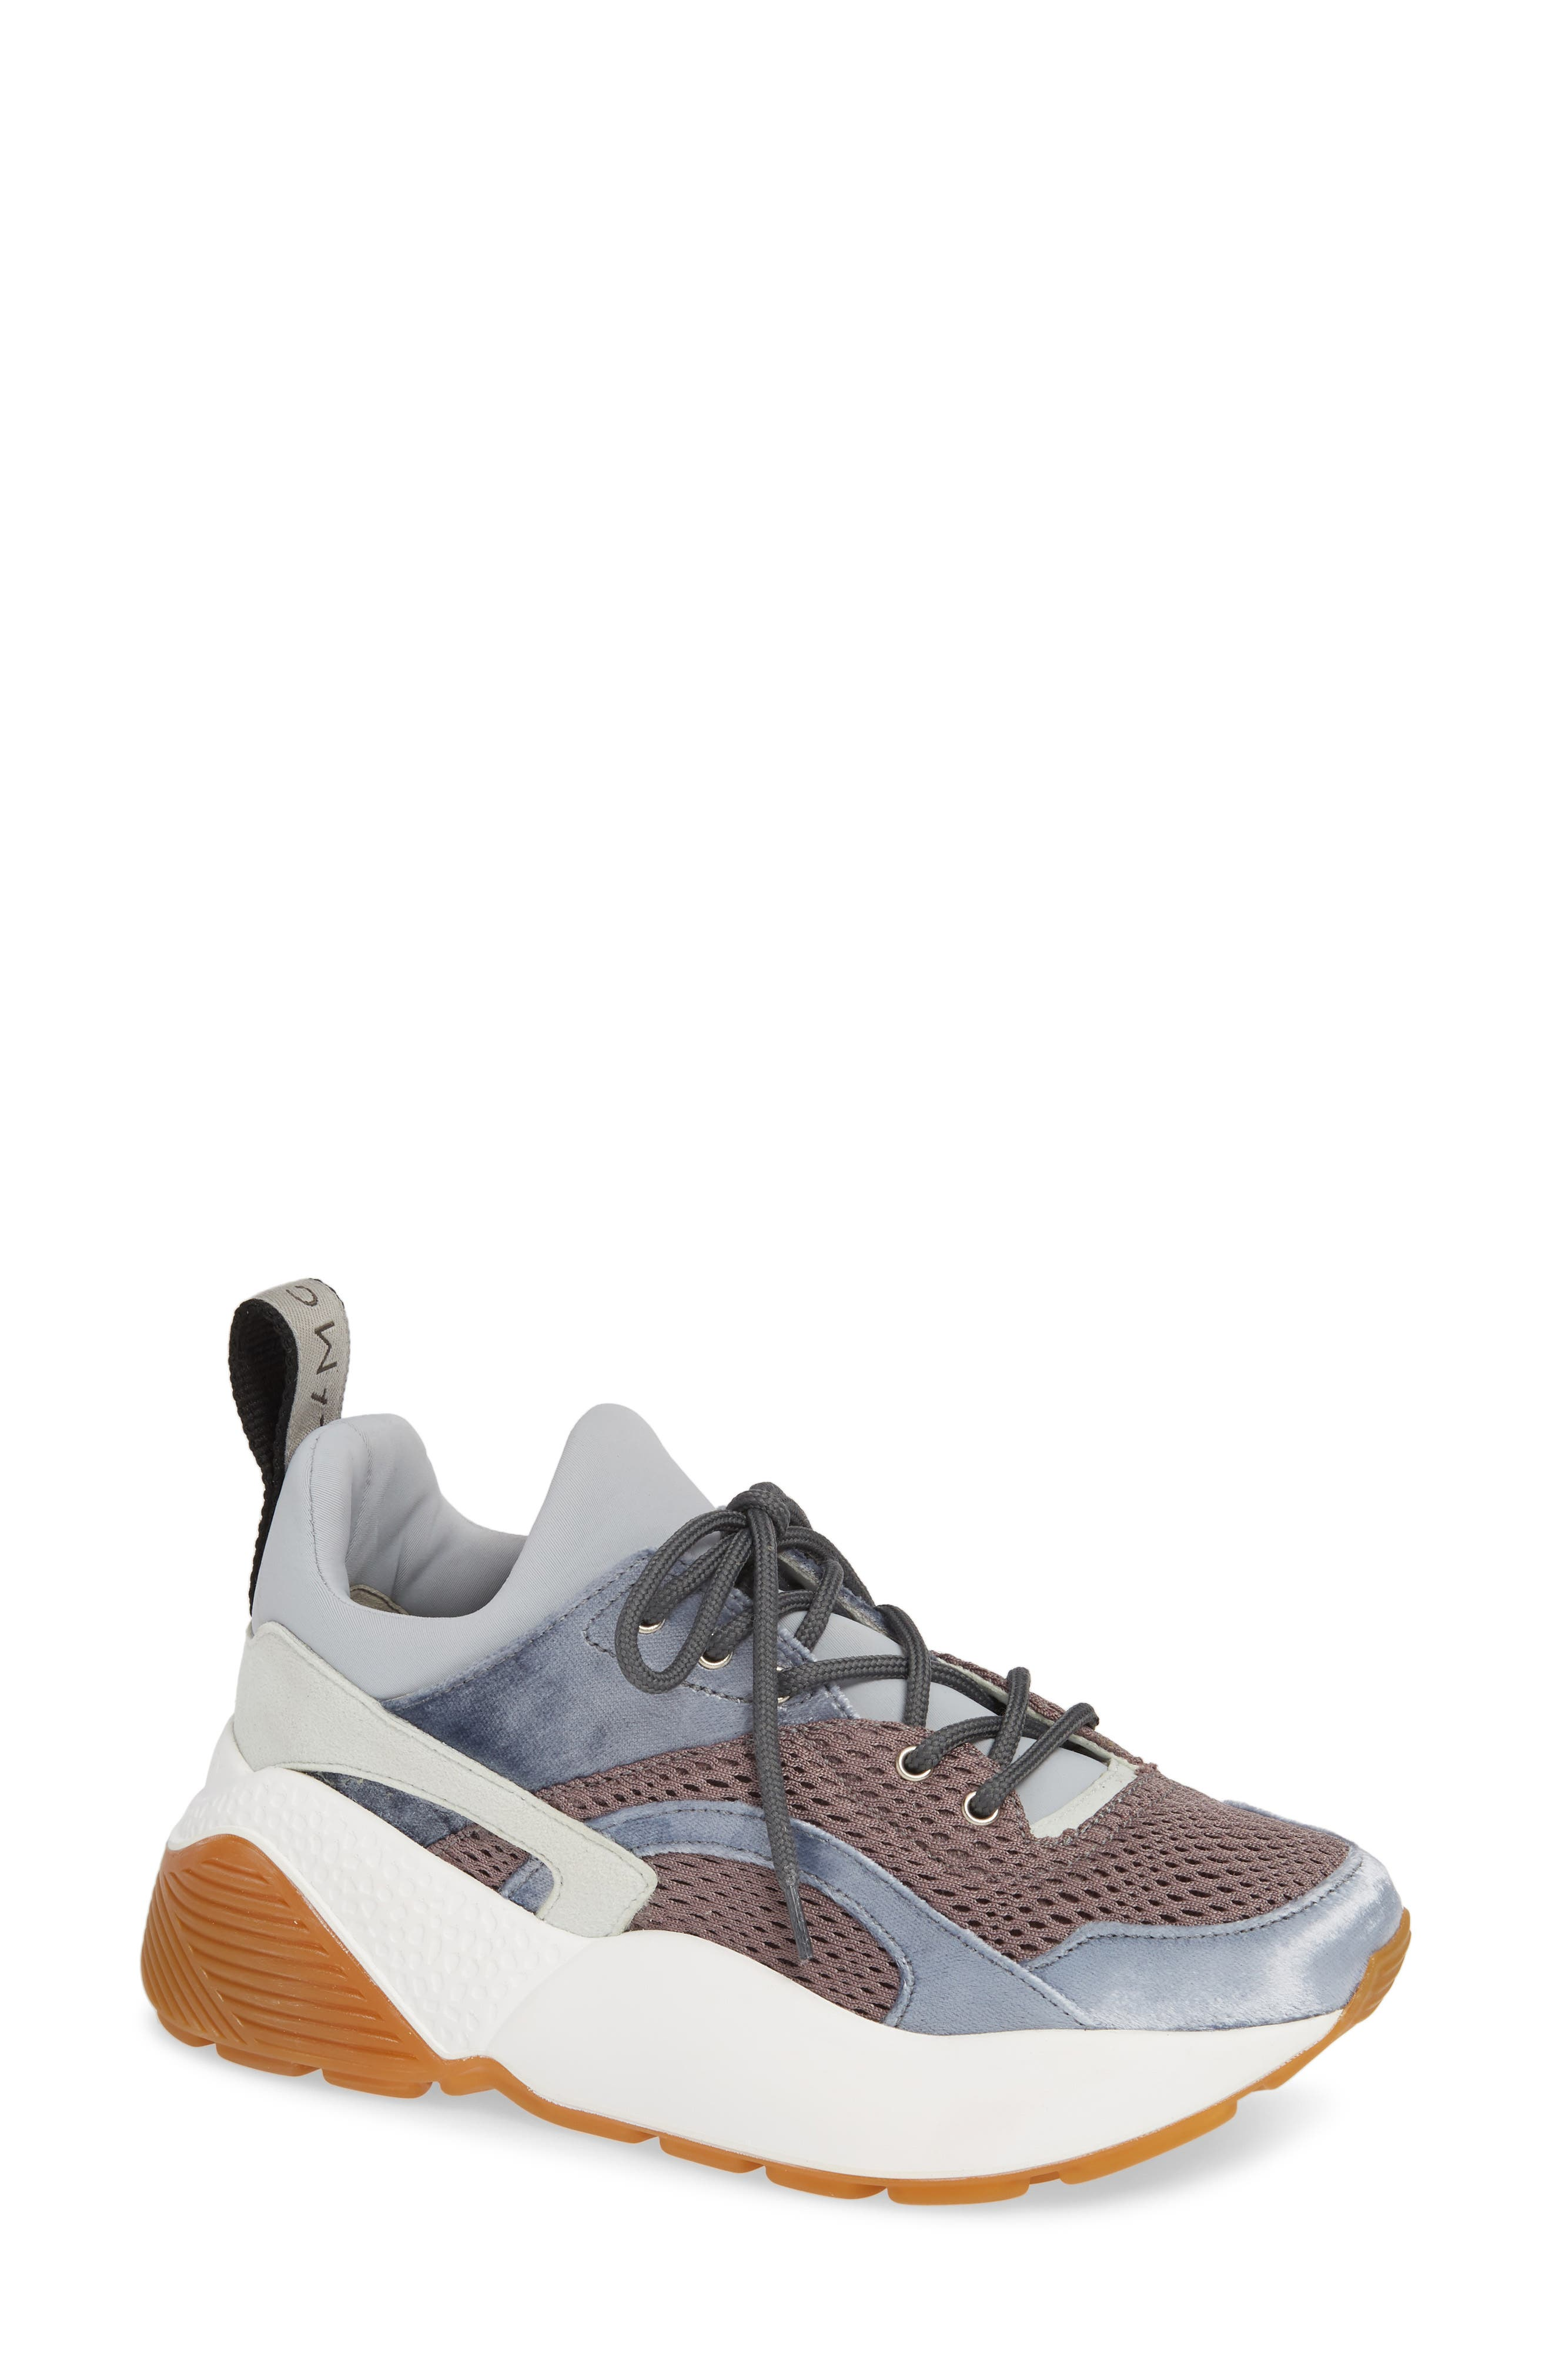 Women's Stella Mccartney Sneakers & Running Shoes | Nordstrom